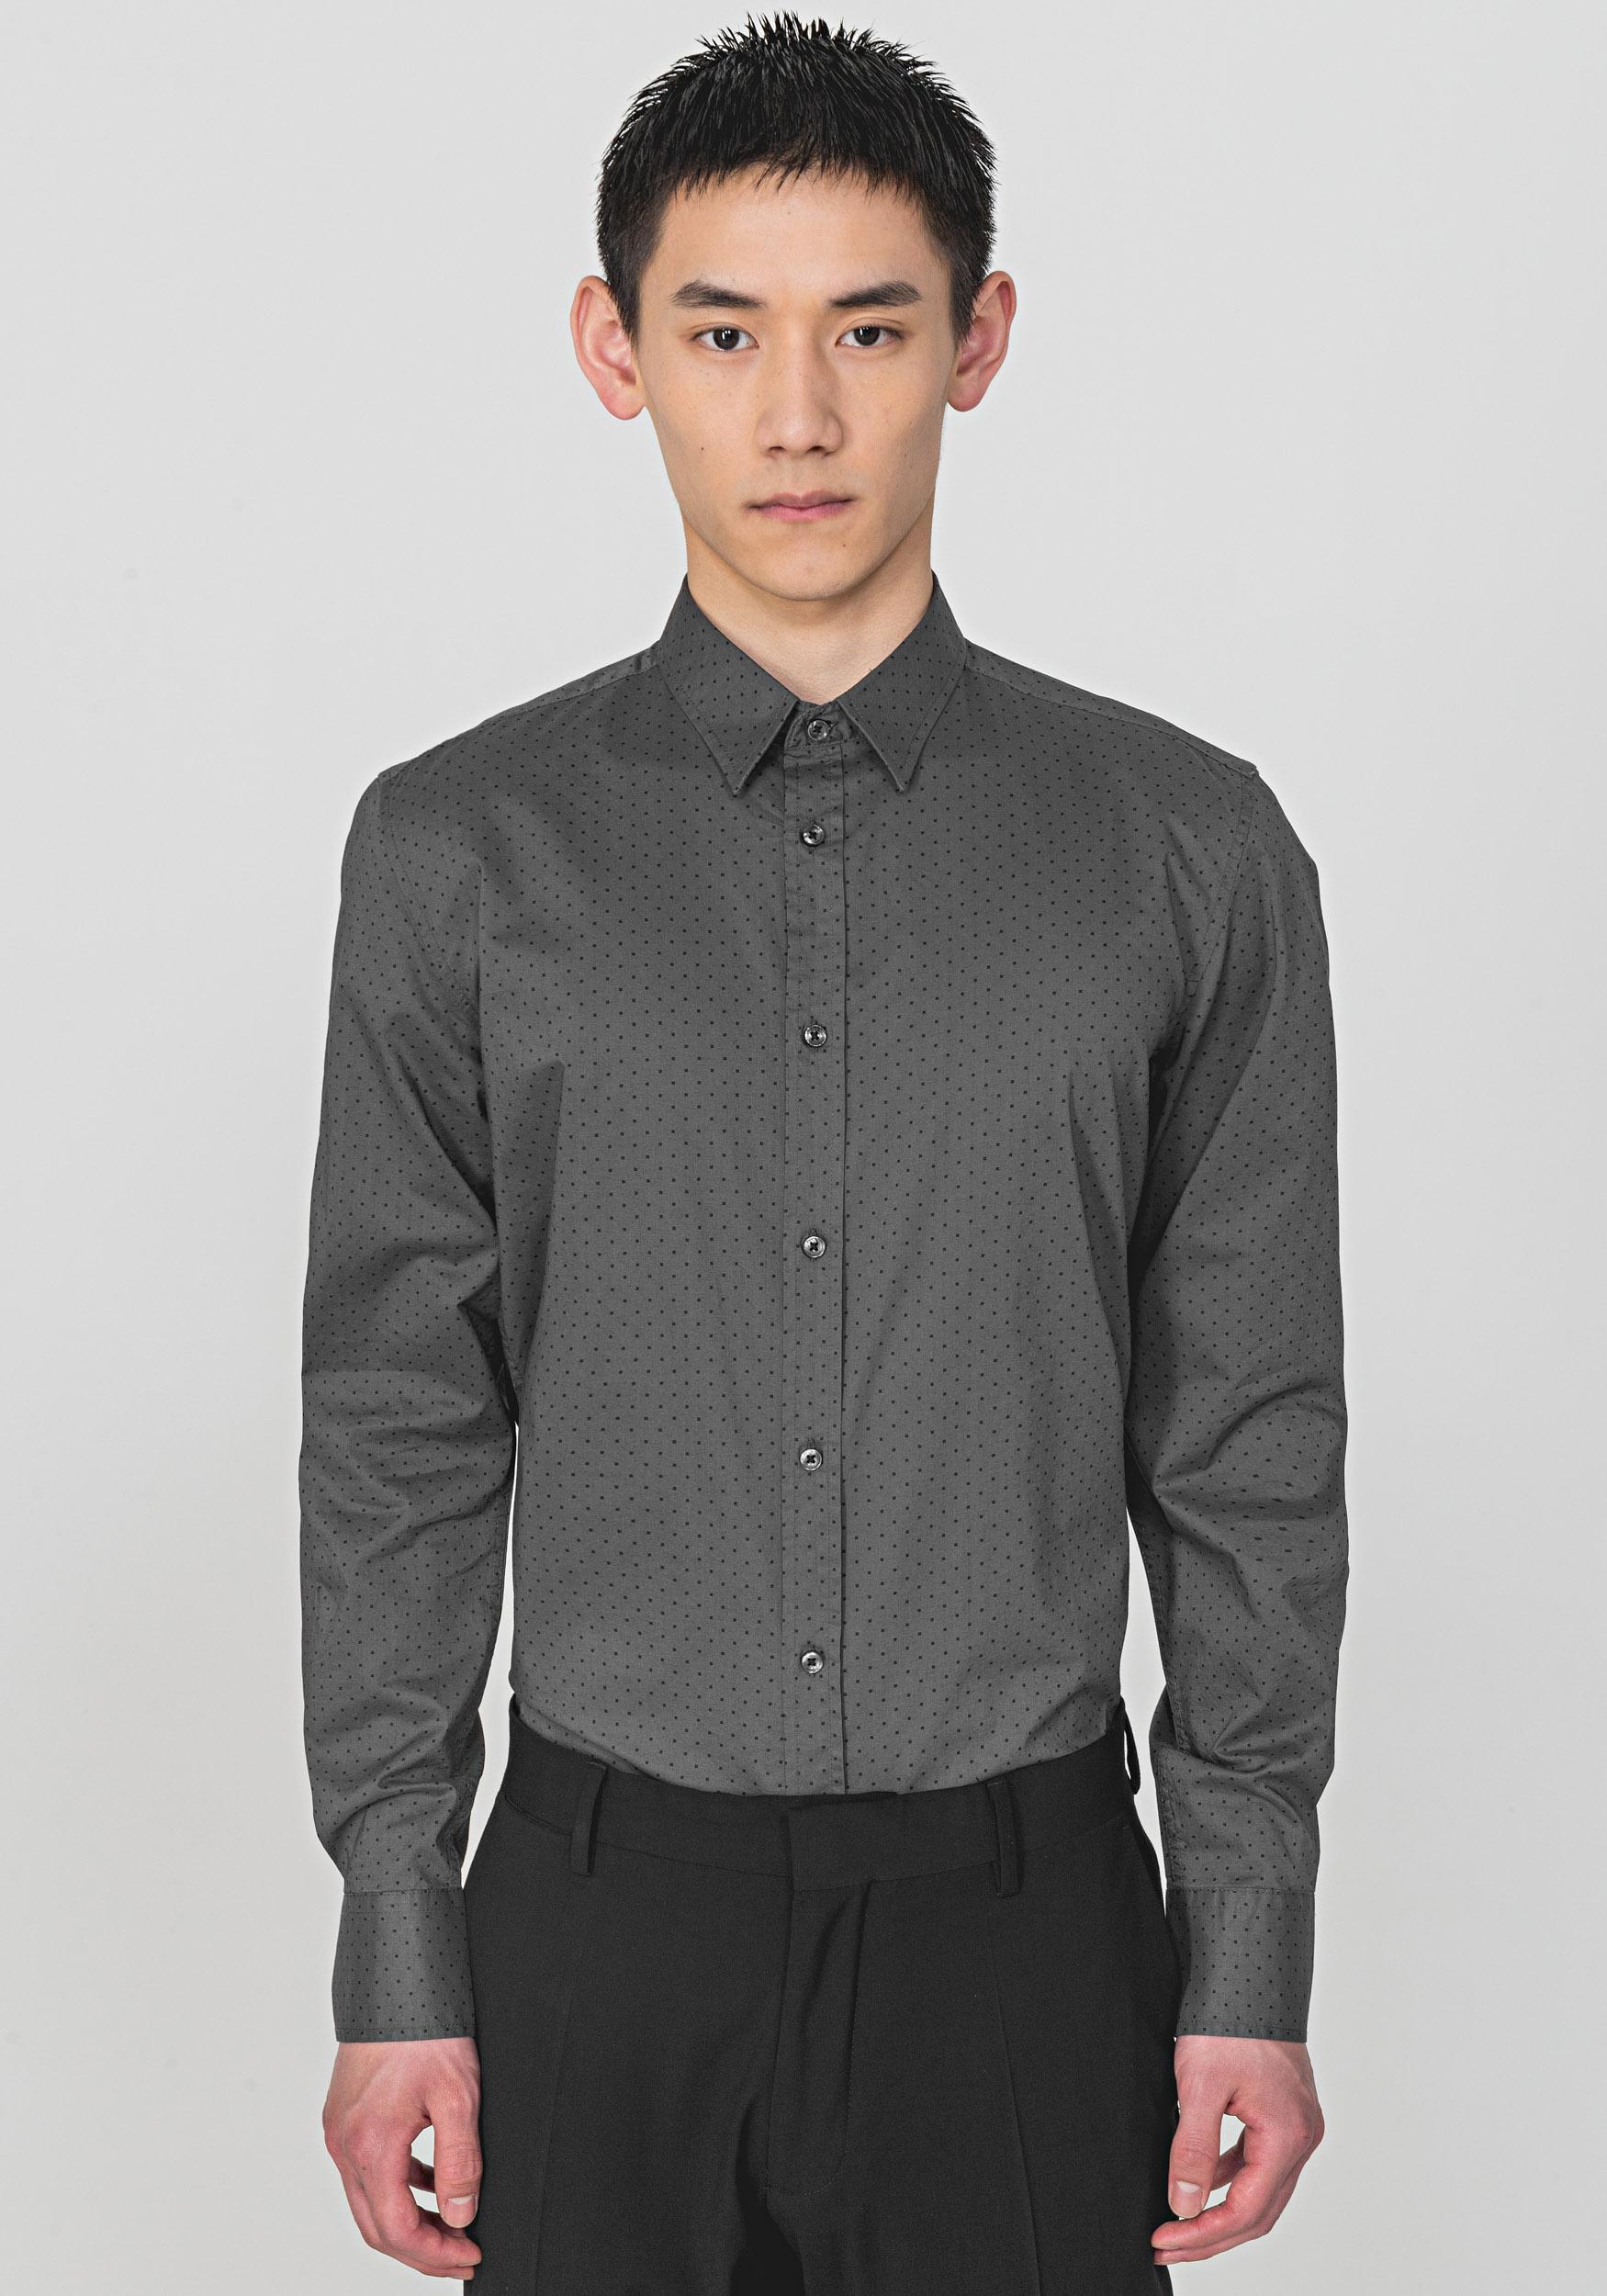 Camisa Antony Morato_Loja Tavares_viseu_51729.cinza.1